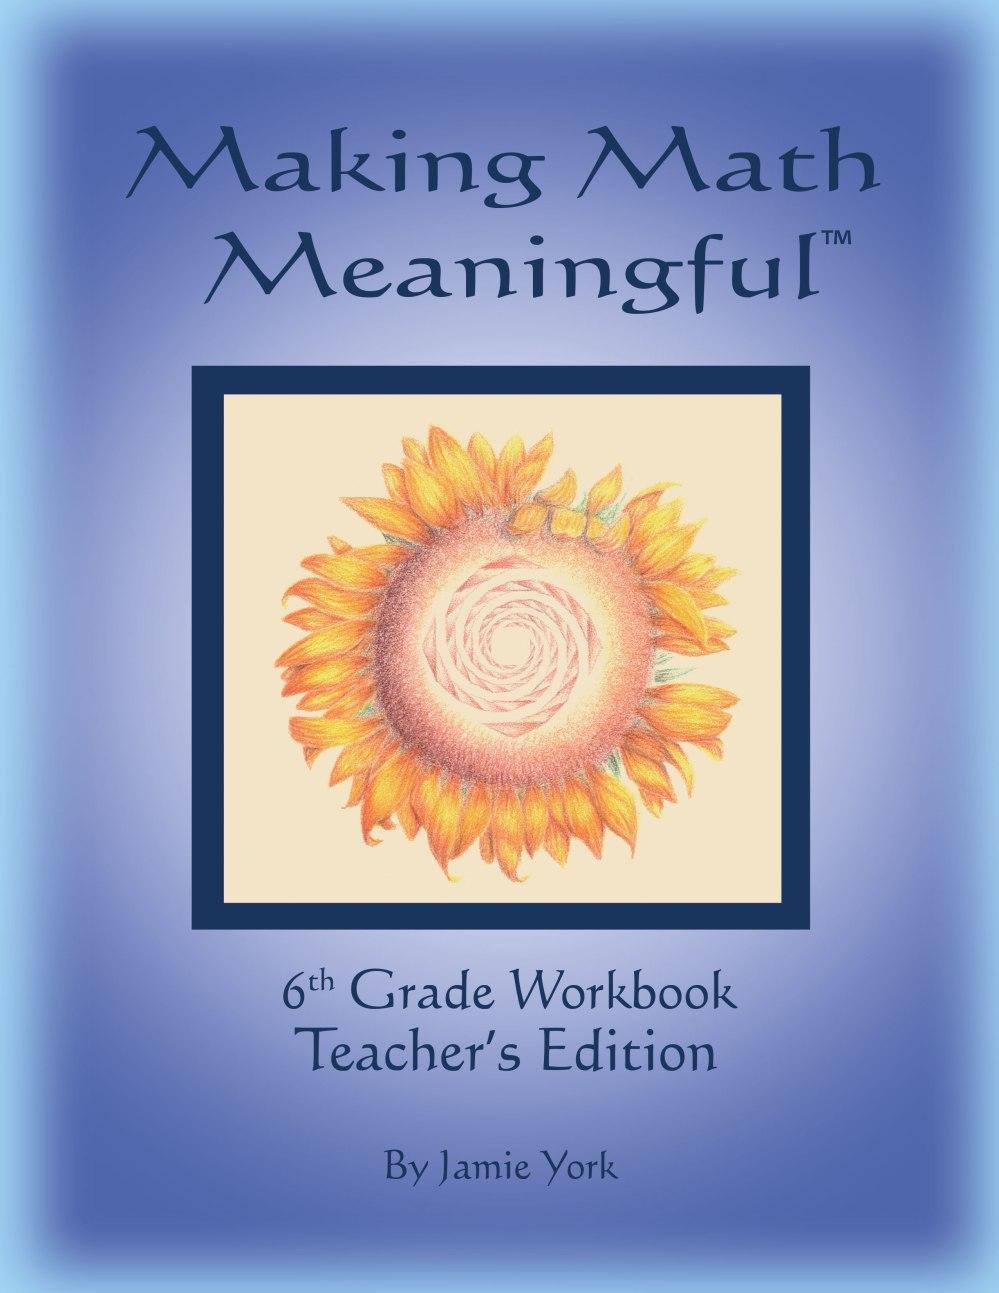 medium resolution of 6th Grade Workbook - Teacher's Edition - Jamie York Press